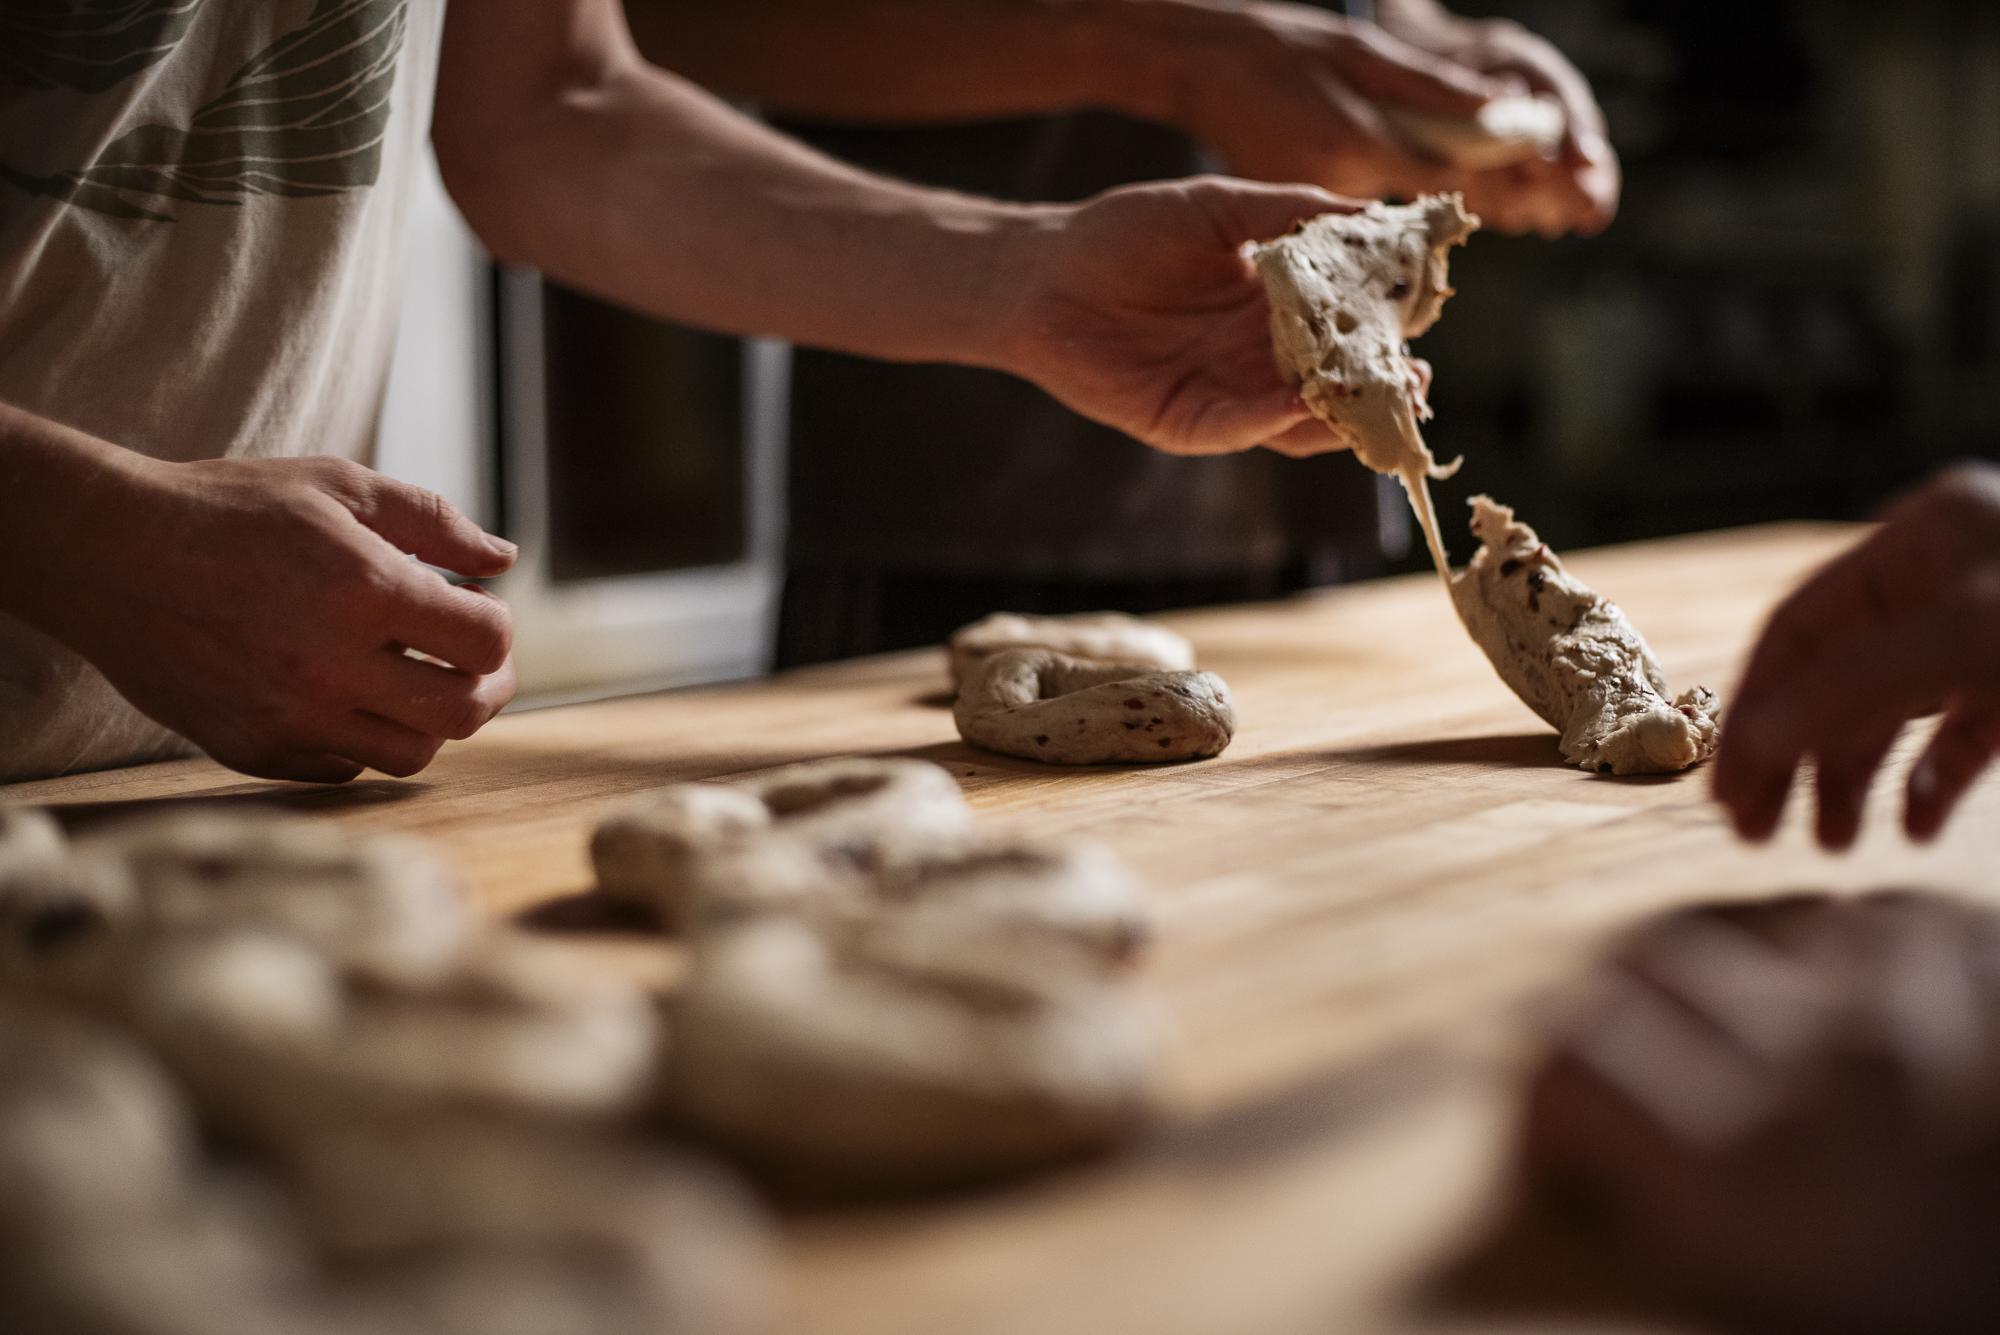 Home Free Bagels  Jack Sorokin Flame Food Photographer Asheville North Carolina NC Bakery Commercial Photography